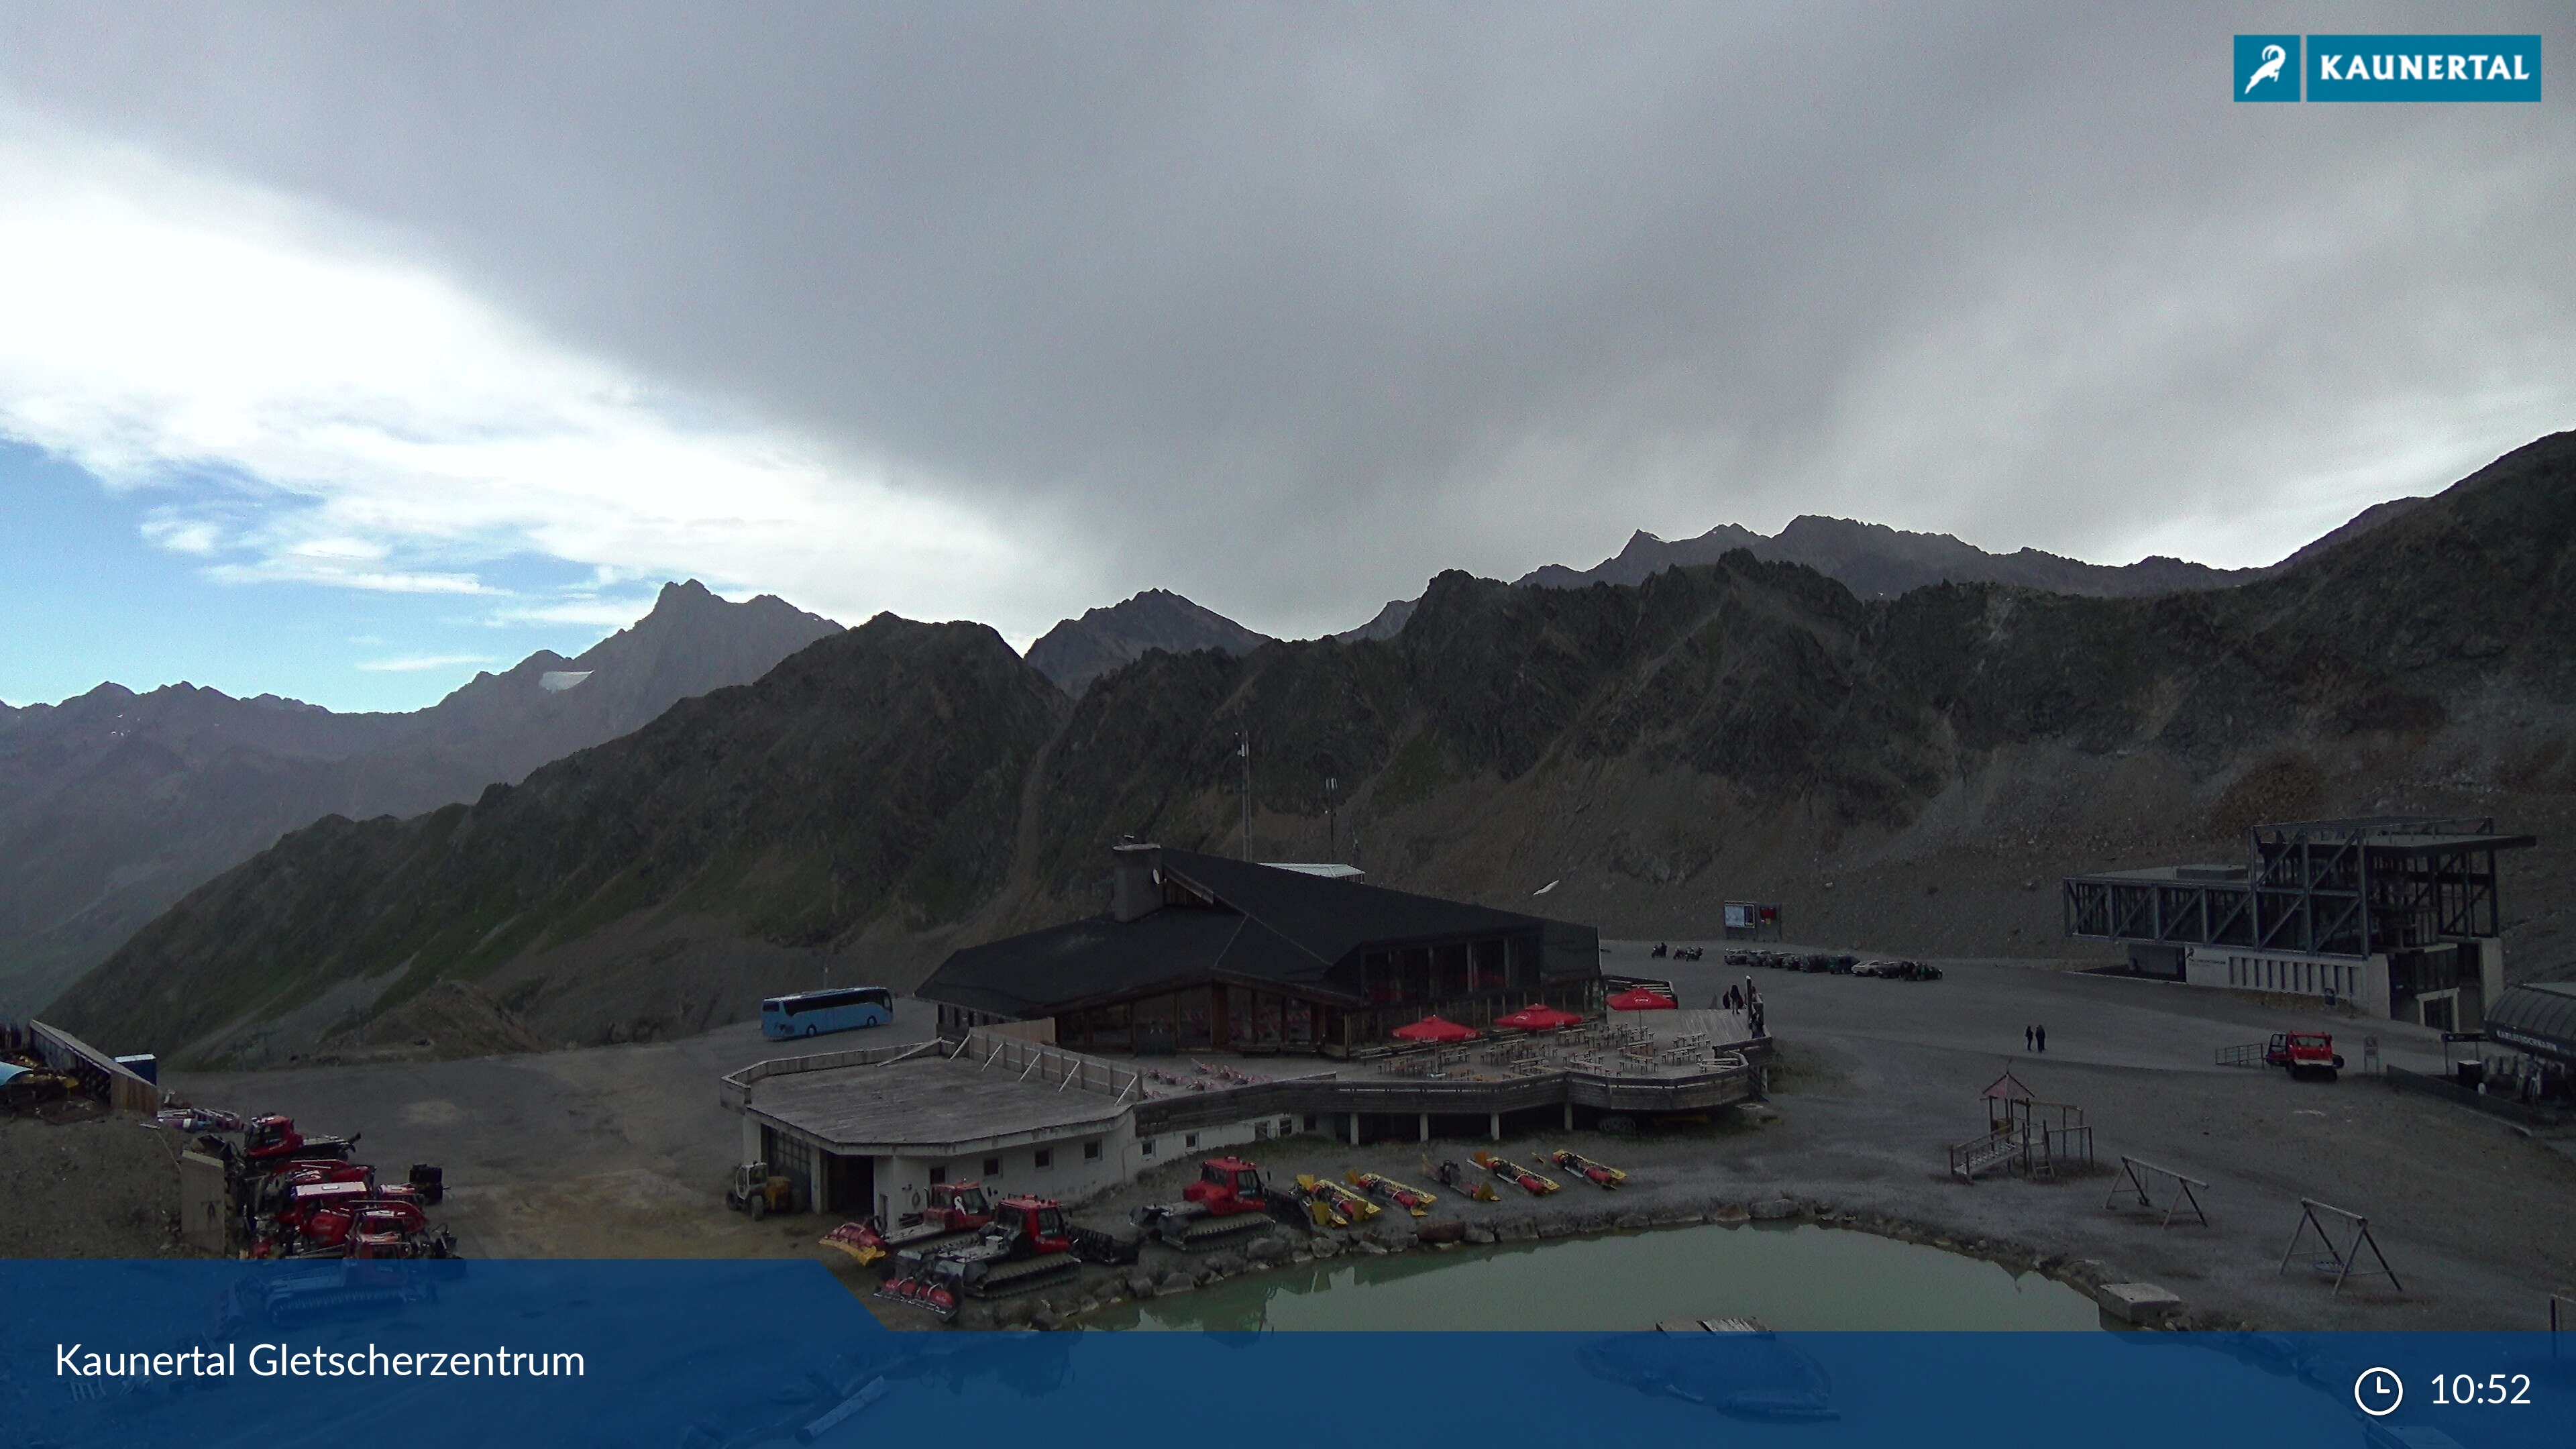 Kaunertal webcam - Kaunertaler glacier 2.750 m